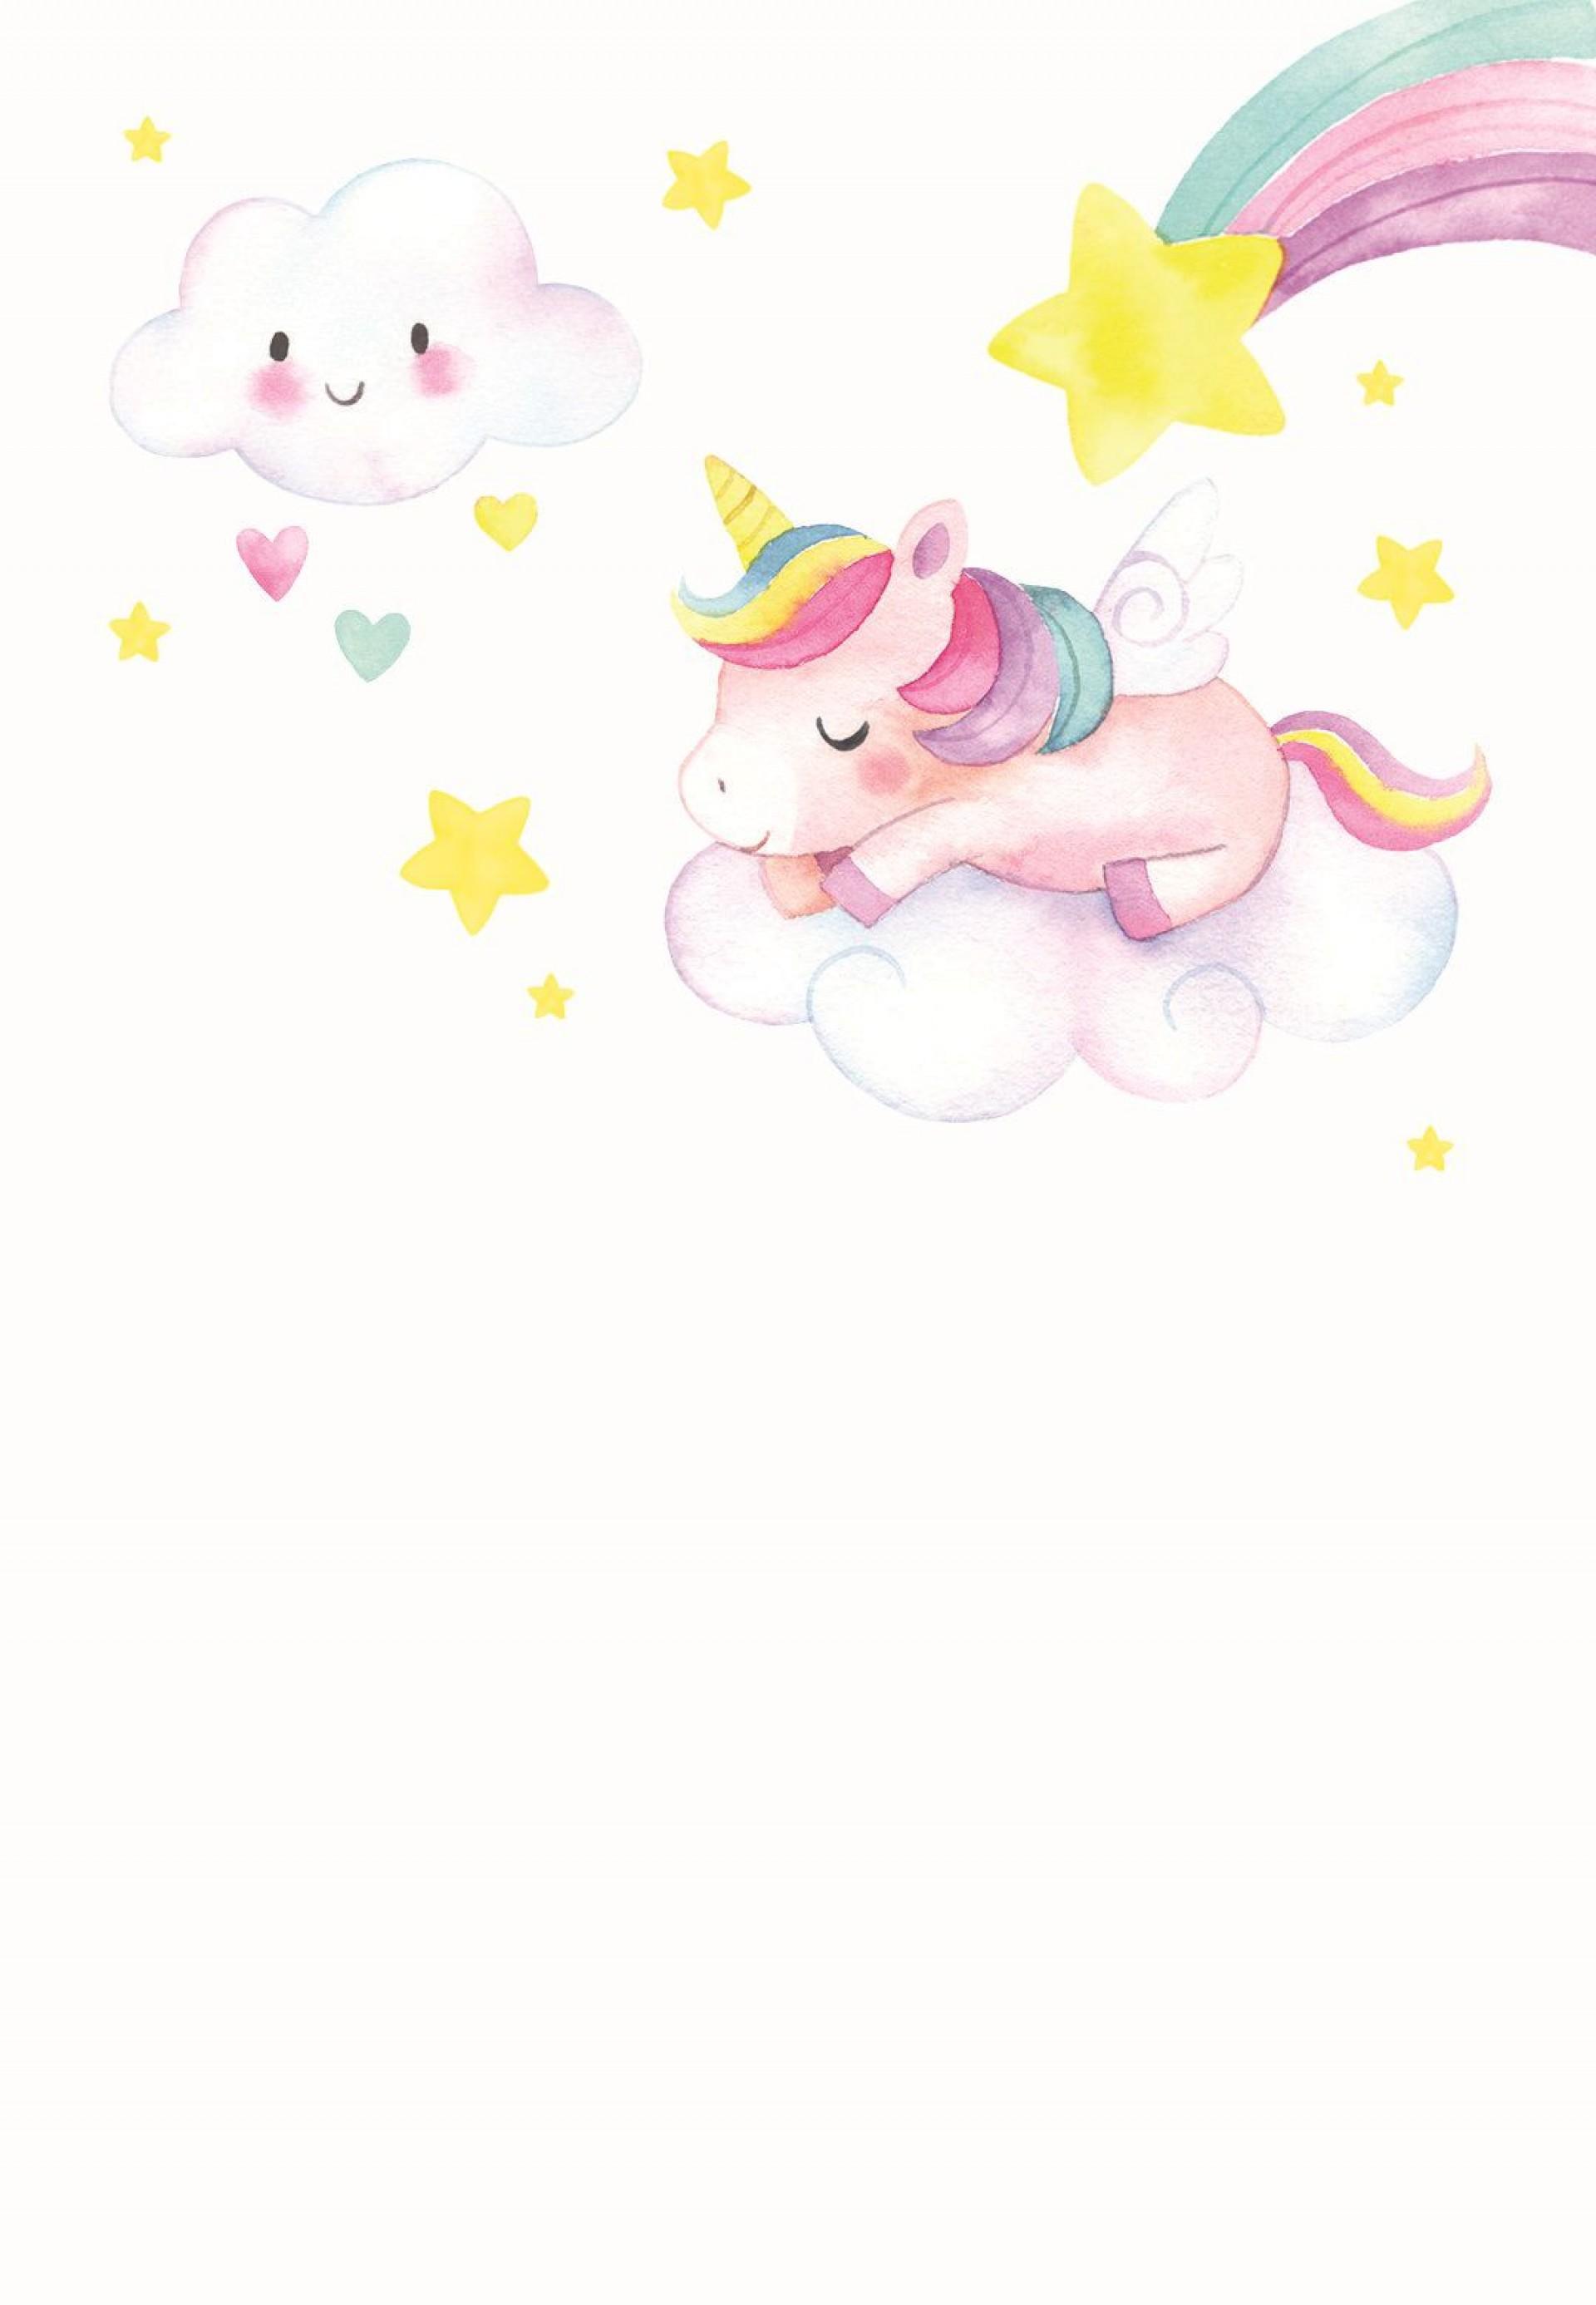 000 Imposing Unicorn Baby Shower Template Free Download Photo  Printable Invitation1920